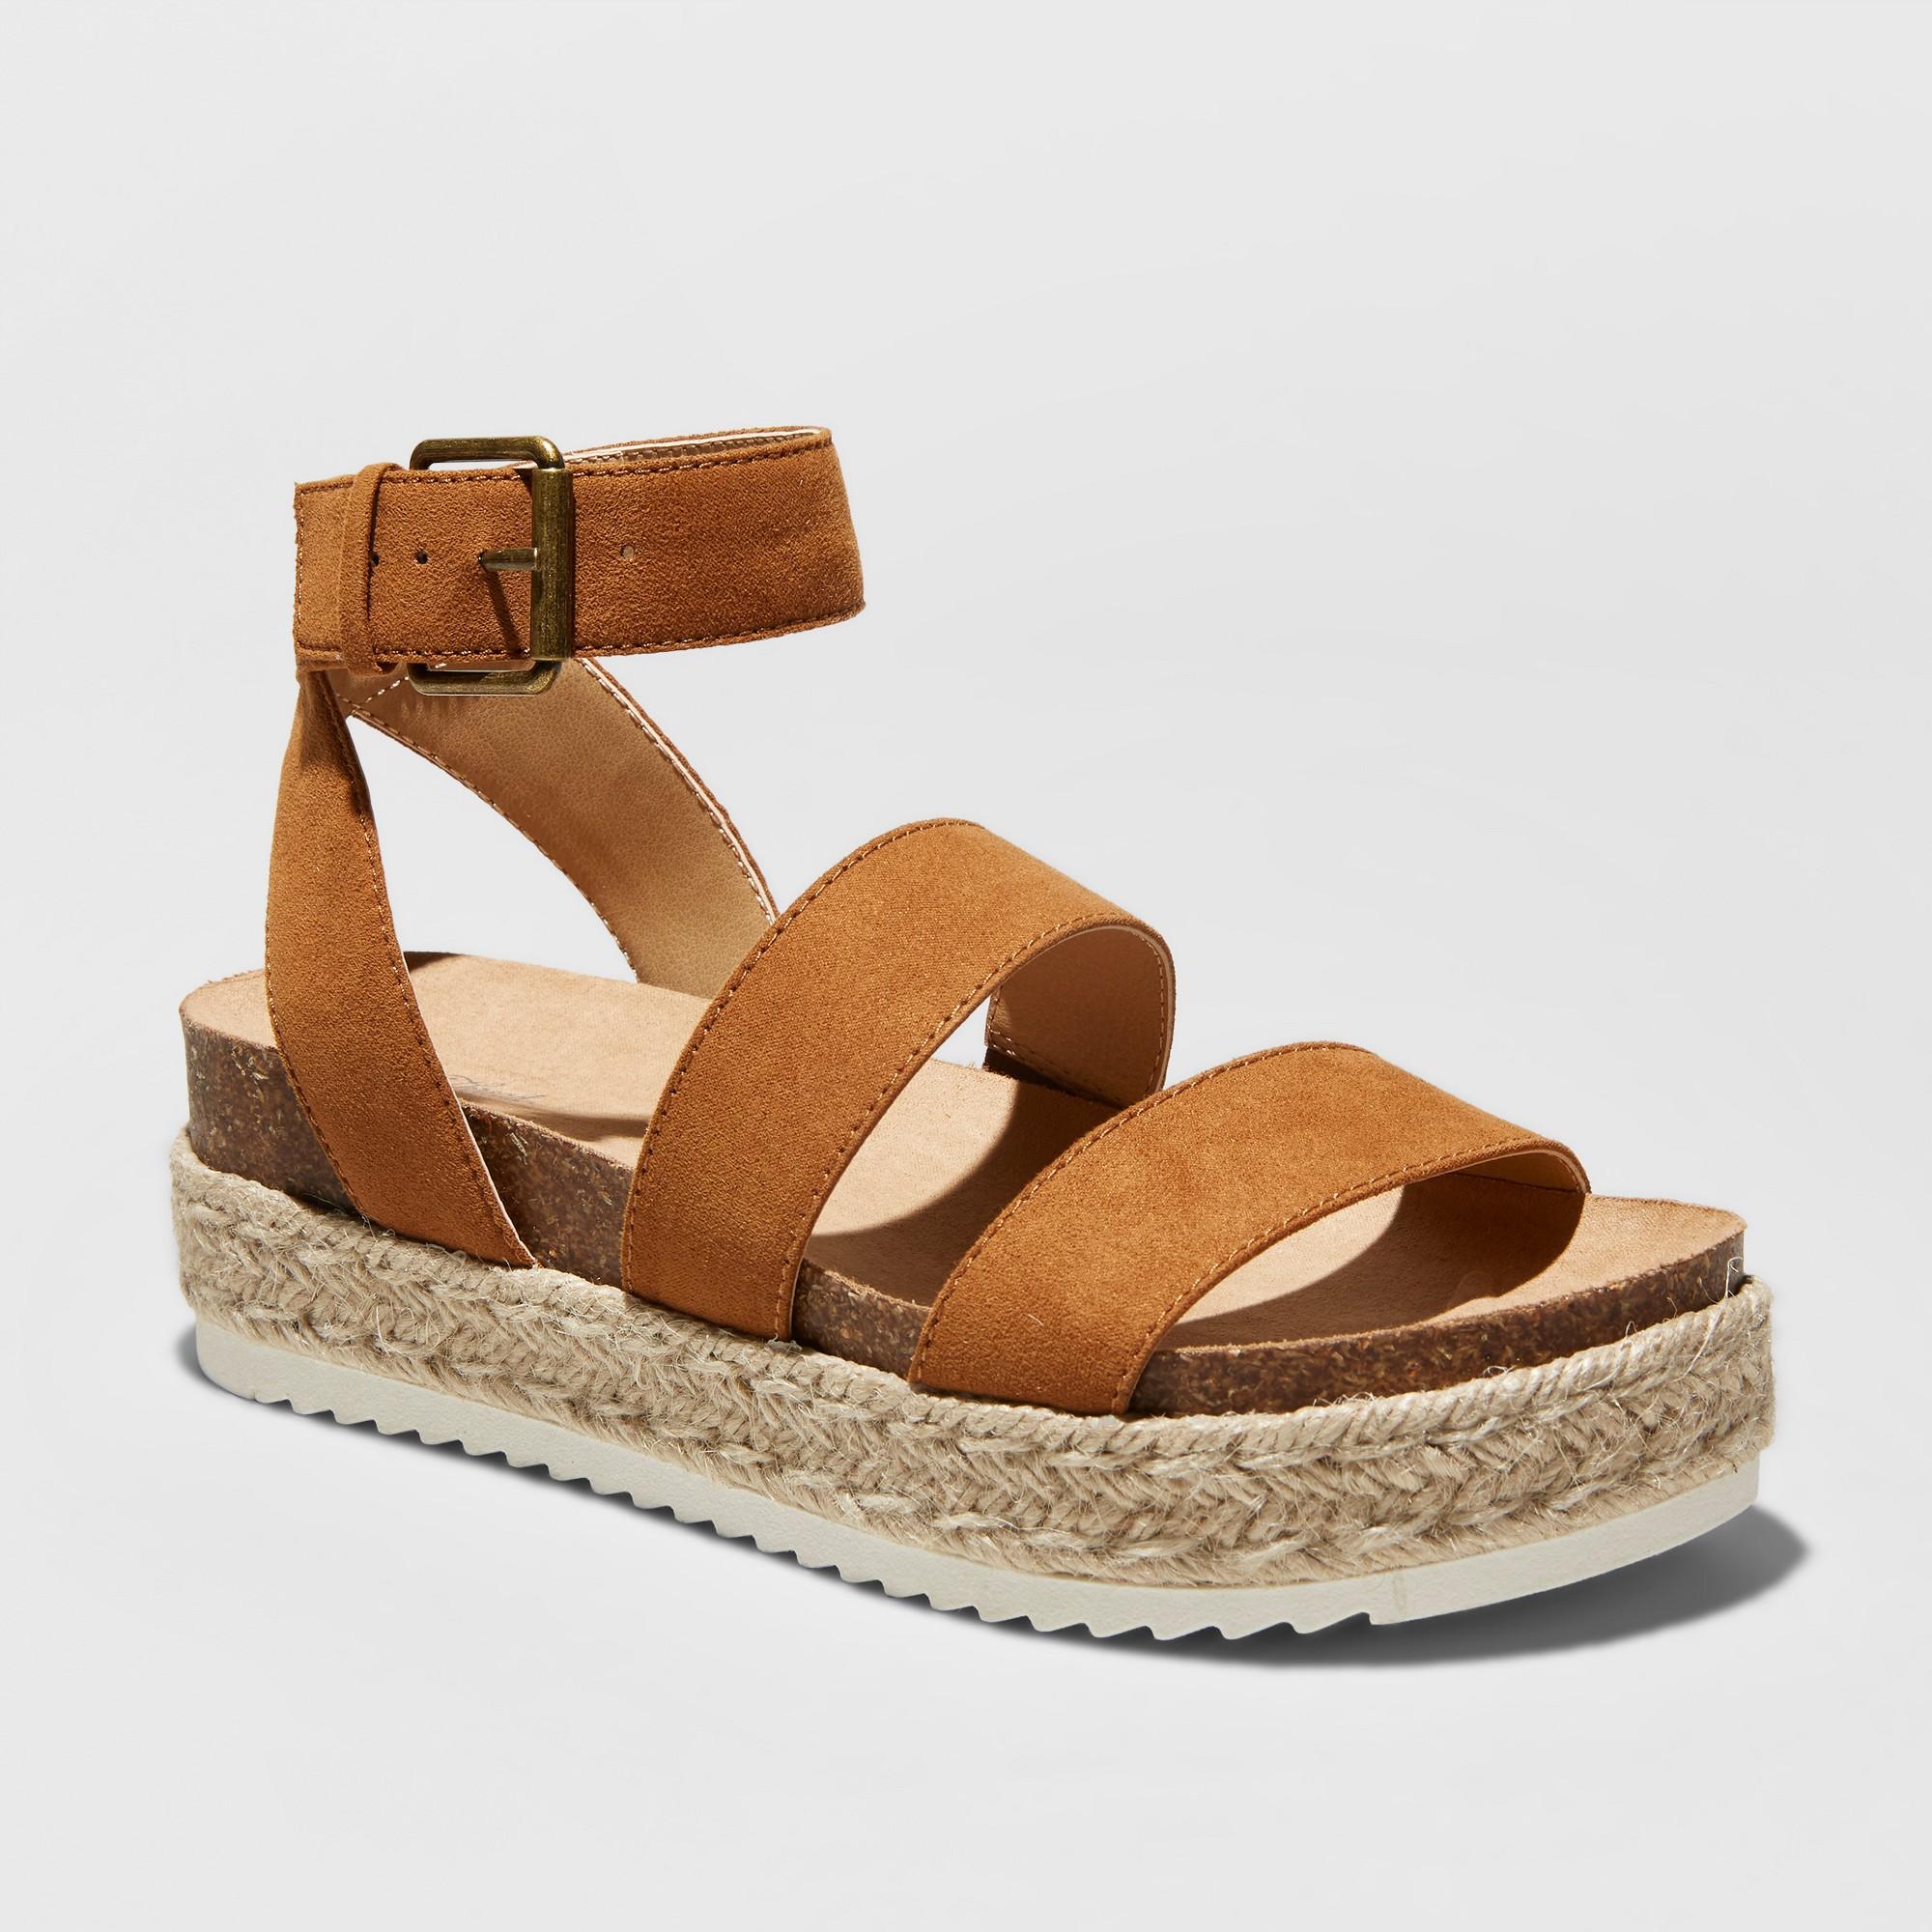 9d14a567988 Women s Agnes Quarter Strap Espadrille Flatform Sandals - Universal Thread  Cognac (Red) 11